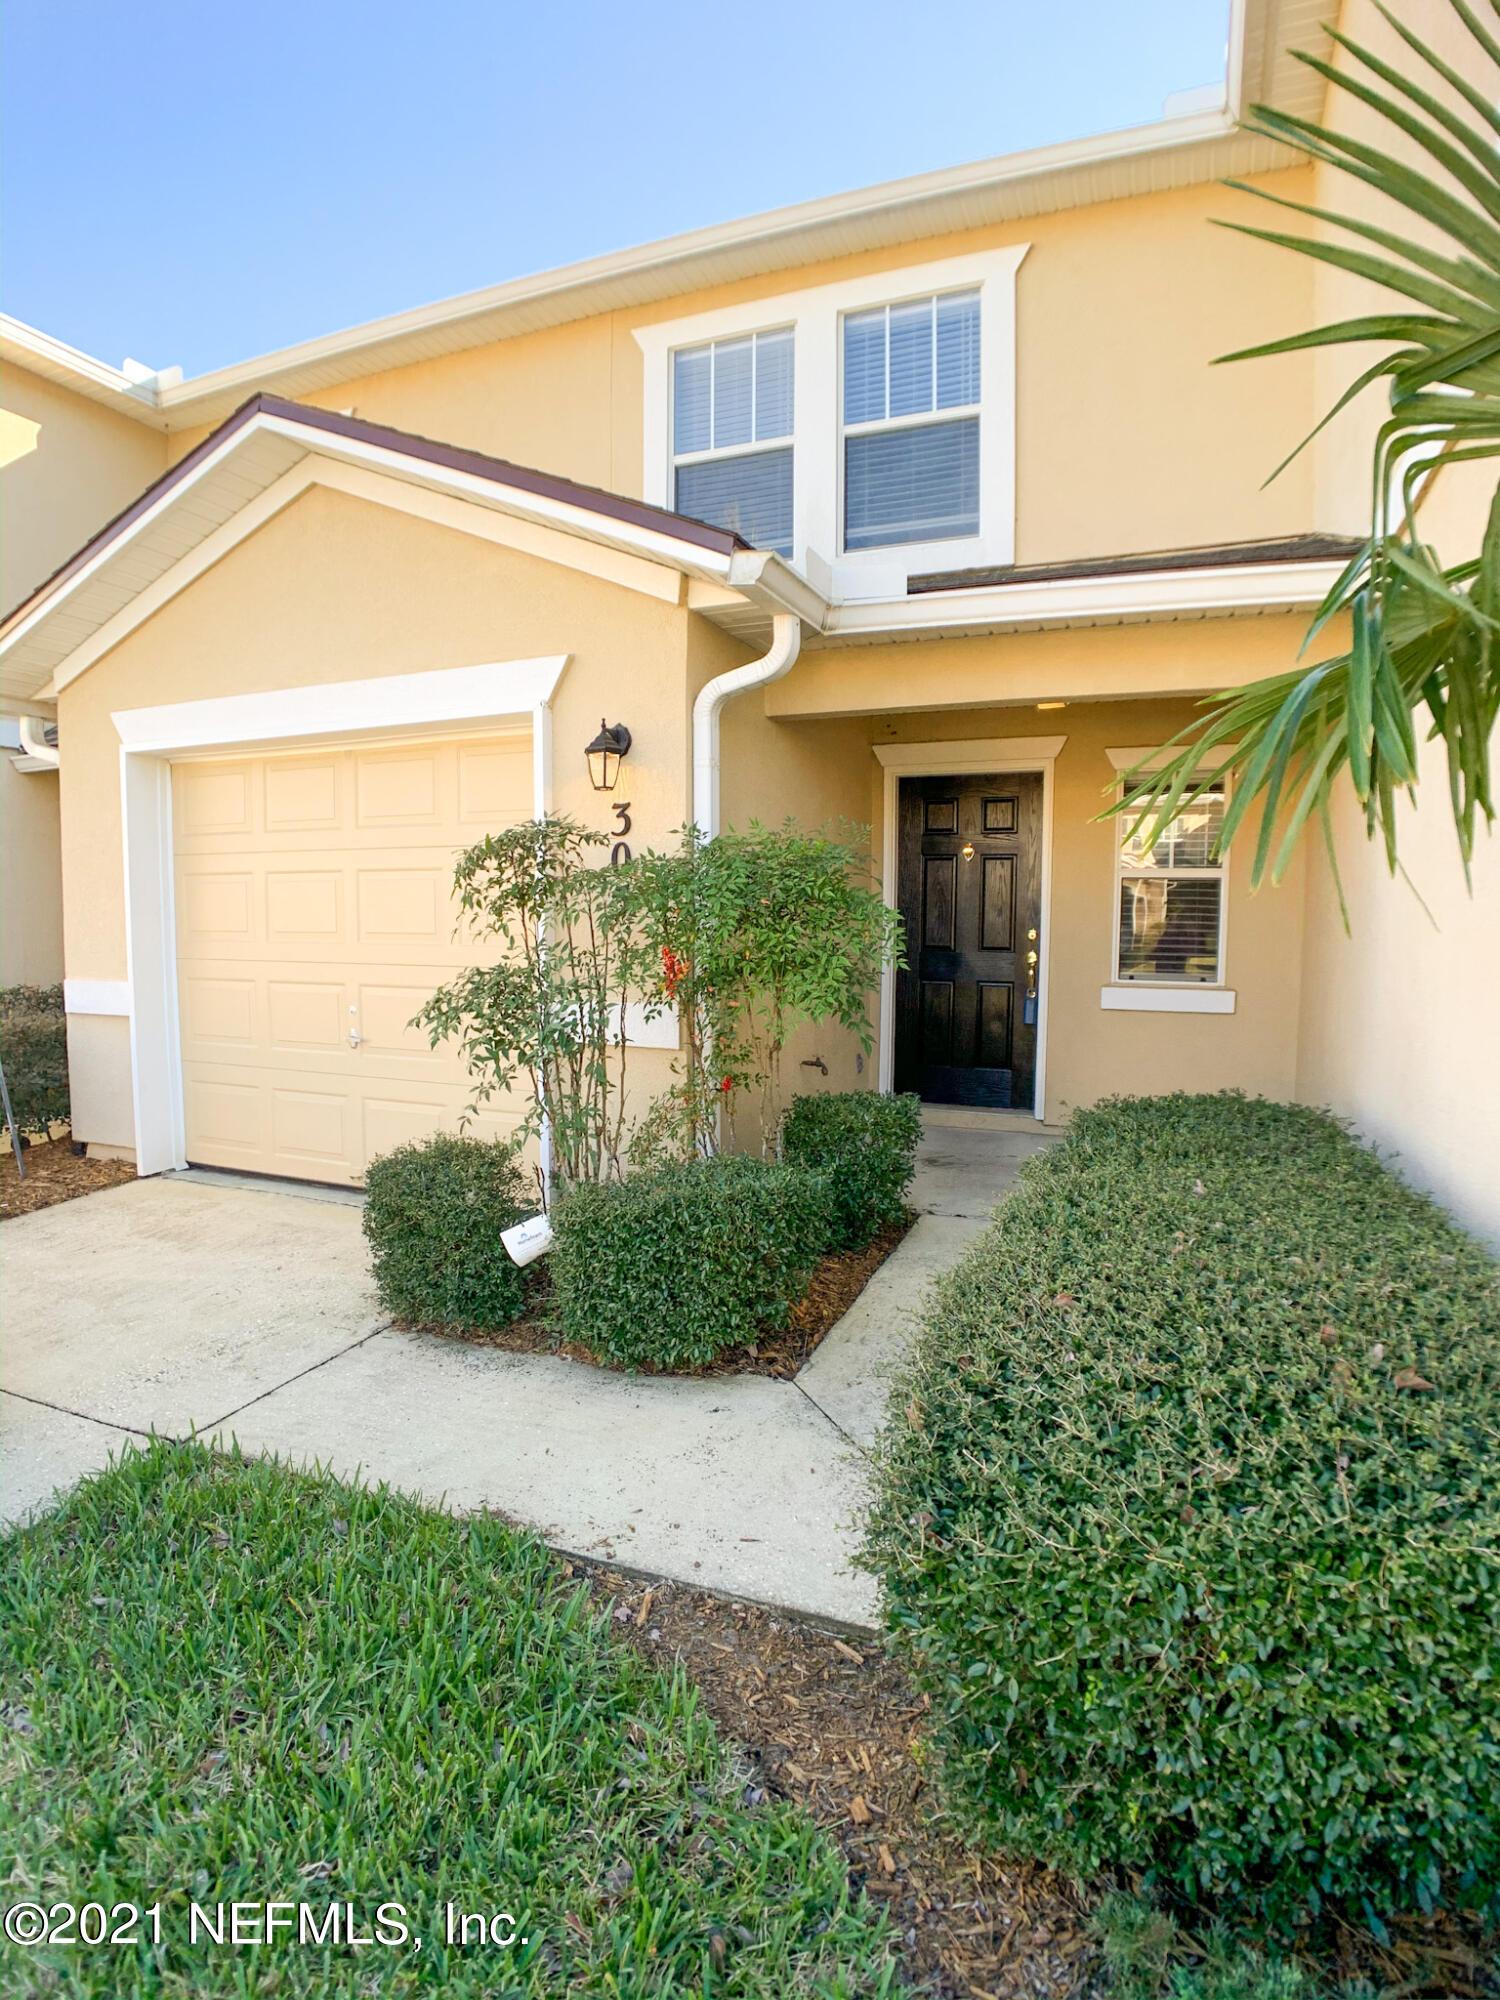 1500 CALMING WATER, FLEMING ISLAND, FLORIDA 32003, 2 Bedrooms Bedrooms, ,2 BathroomsBathrooms,Residential,For sale,CALMING WATER,1117801